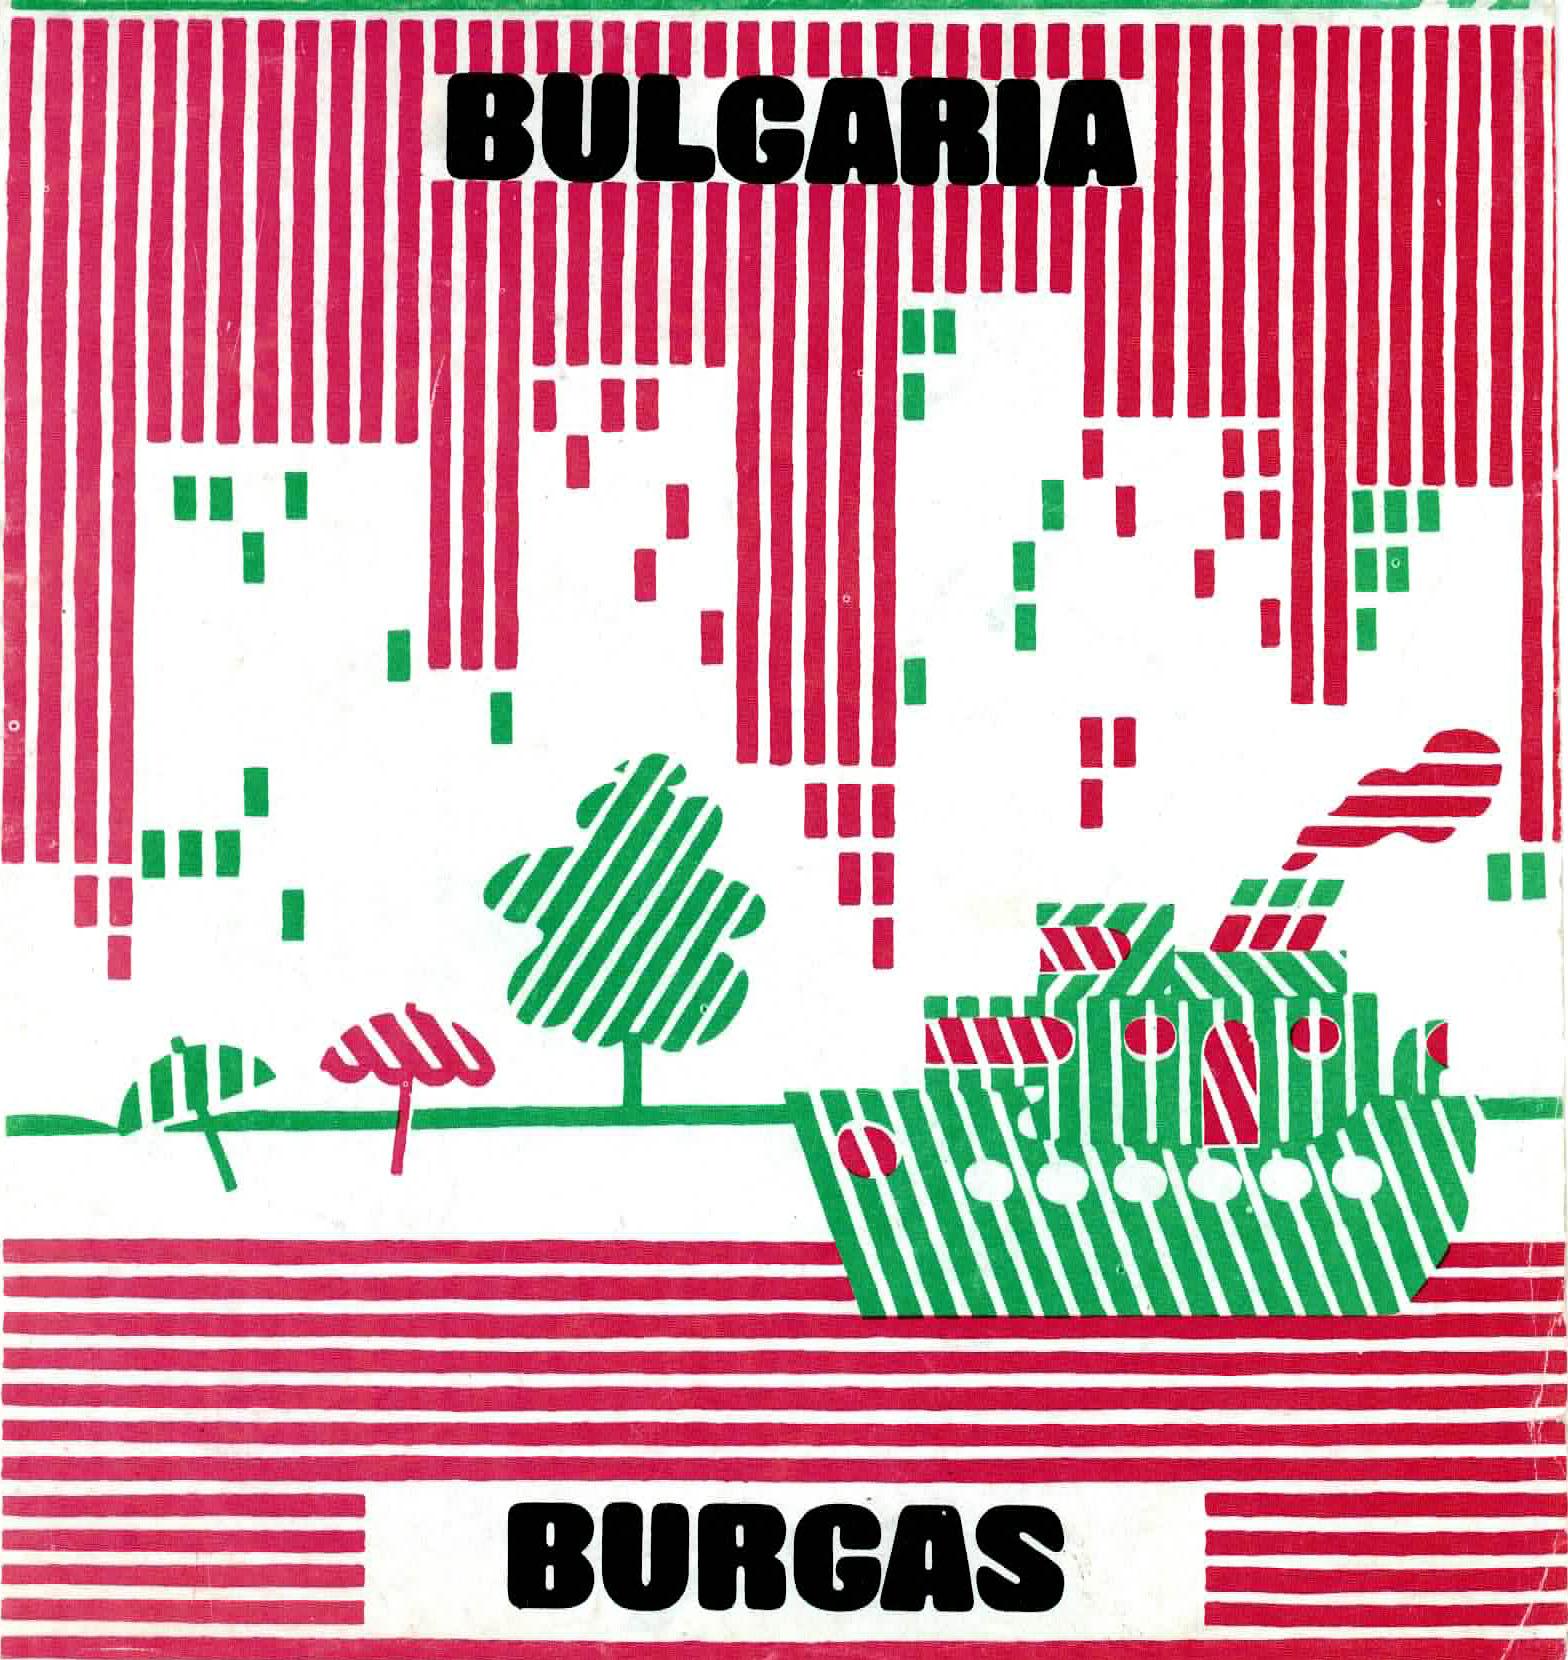 Burgas - Bulgarien